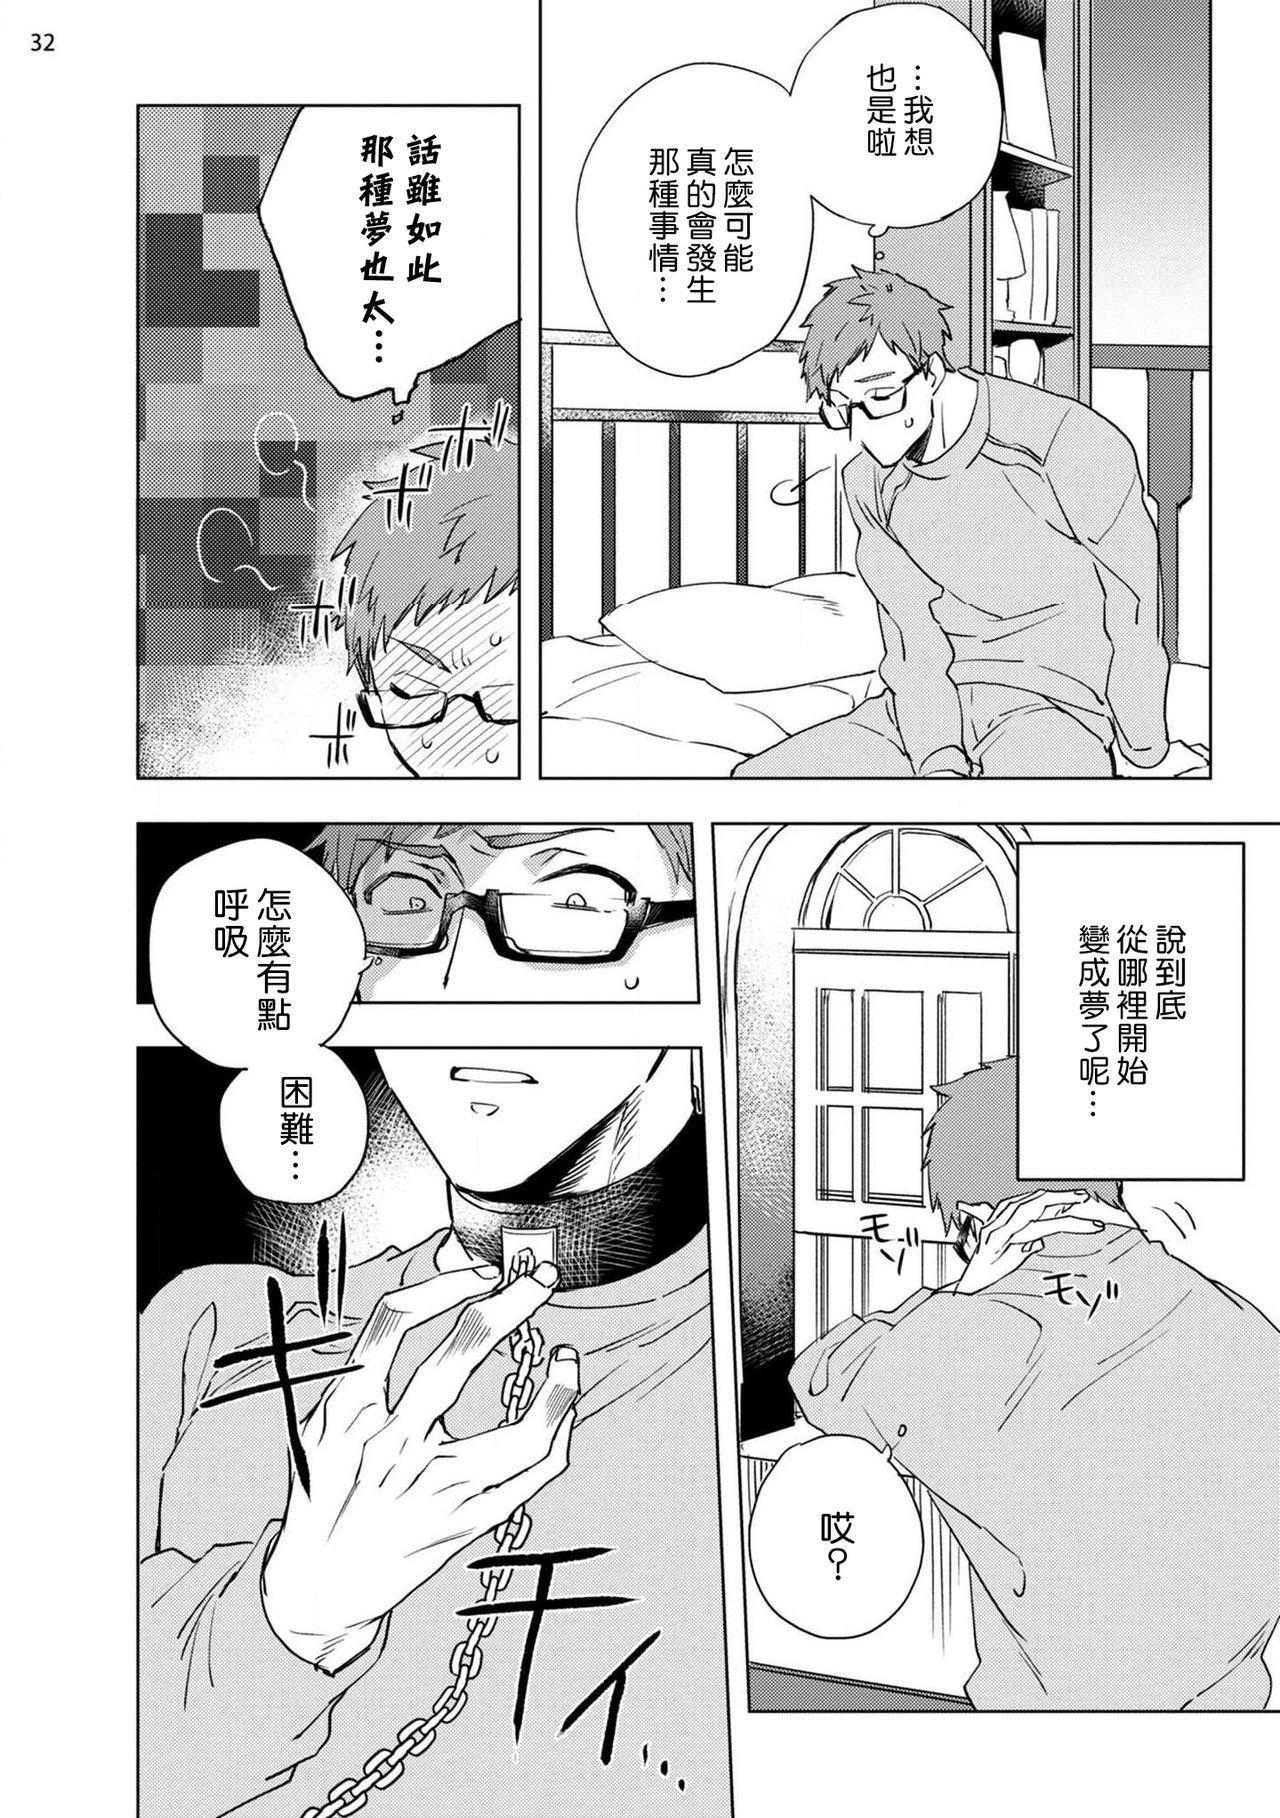 [Yao] Inma-sama ni Hallelujah!   赞美淫魔大人! Ch. 1-3 [Chinese] [拾荒者汉化组] [Digital] 32